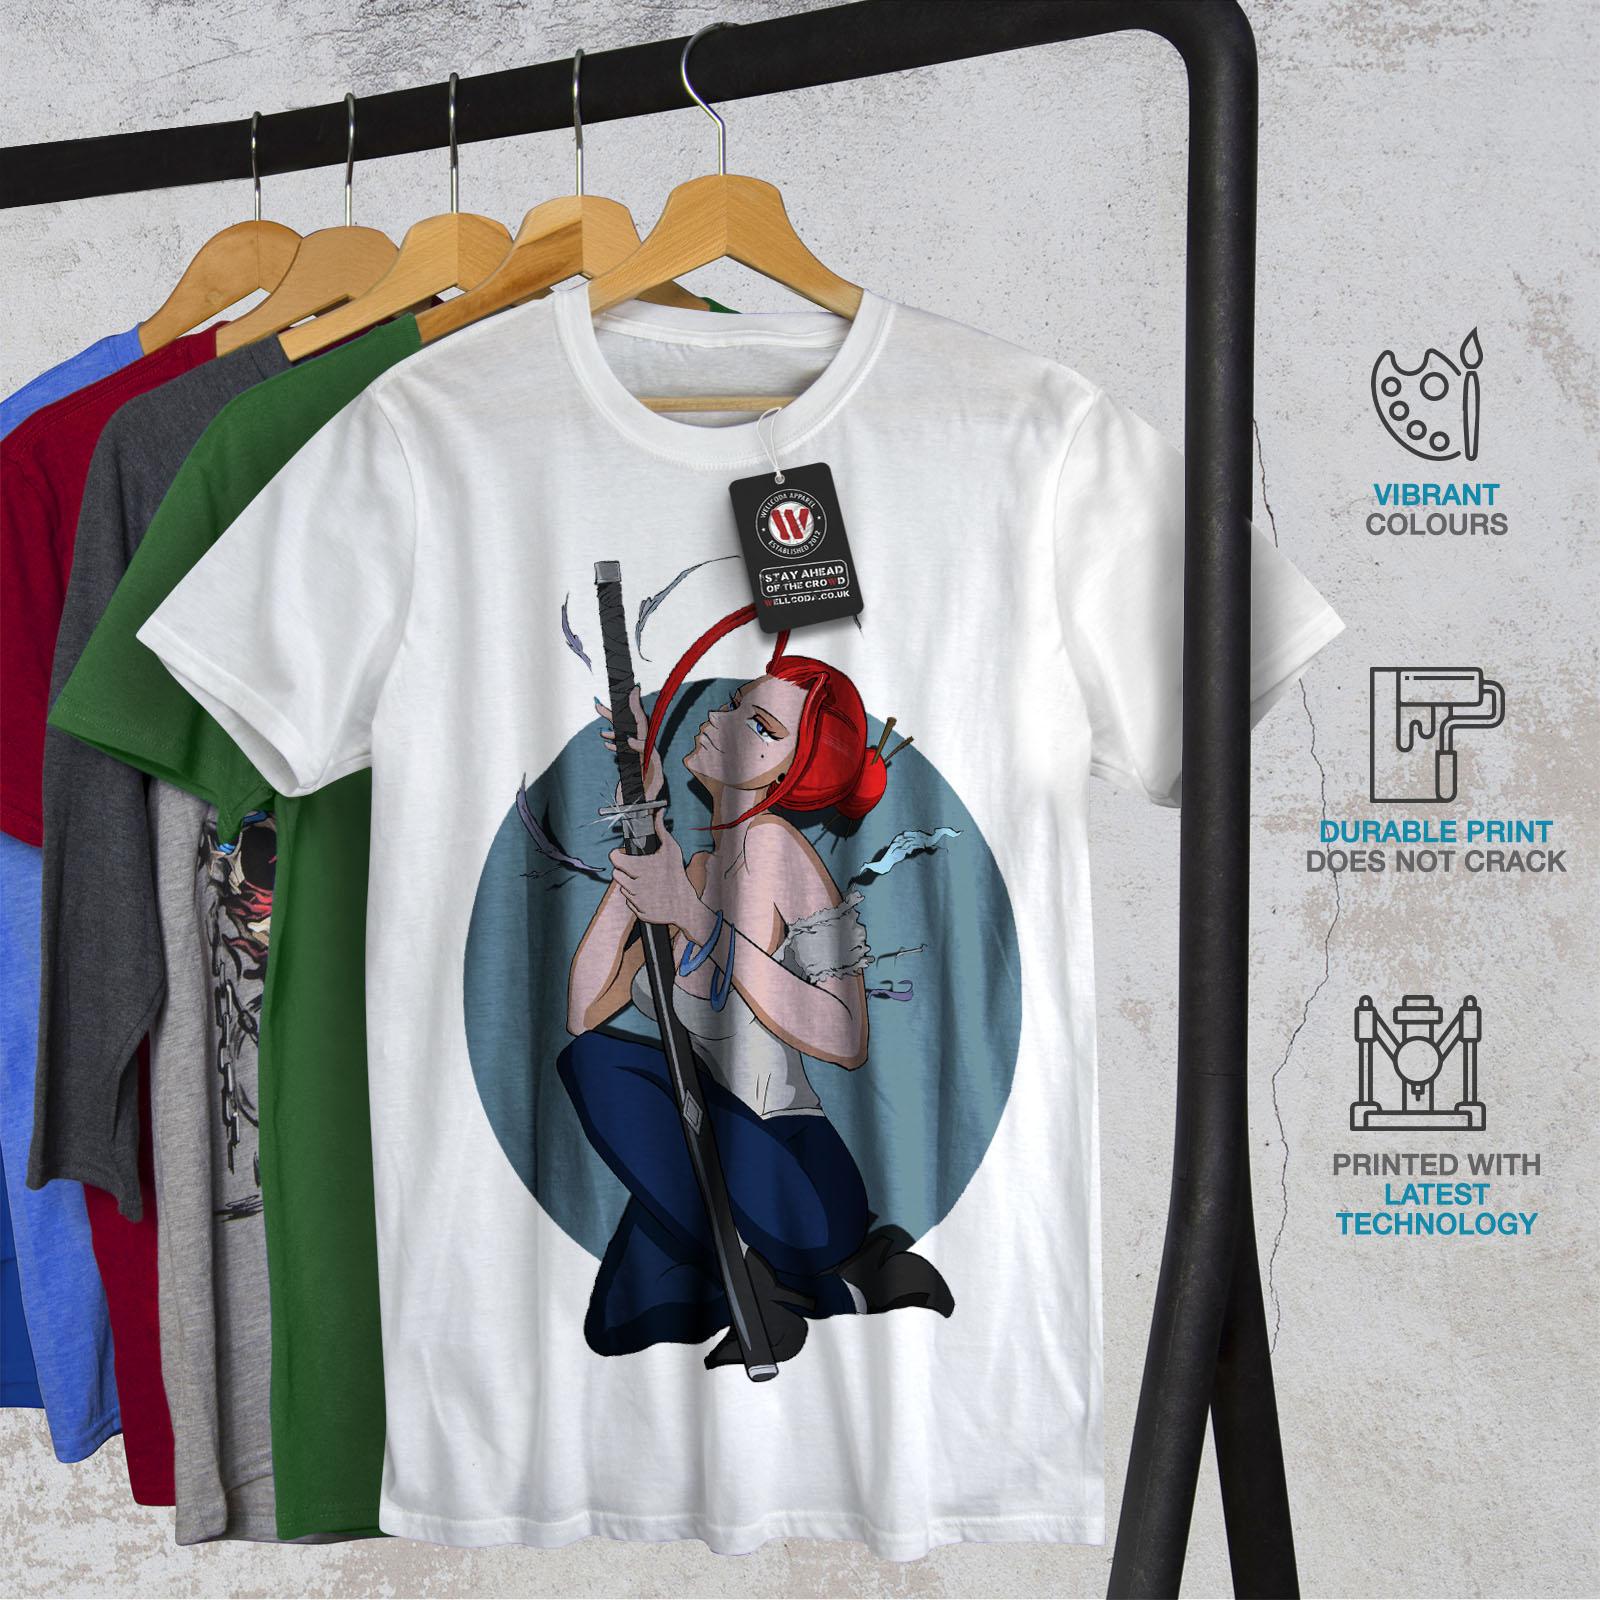 Wellcoda-Anime-Katana-Girl-Mens-T-shirt-Japanese-Graphic-Design-Printed-Tee thumbnail 12